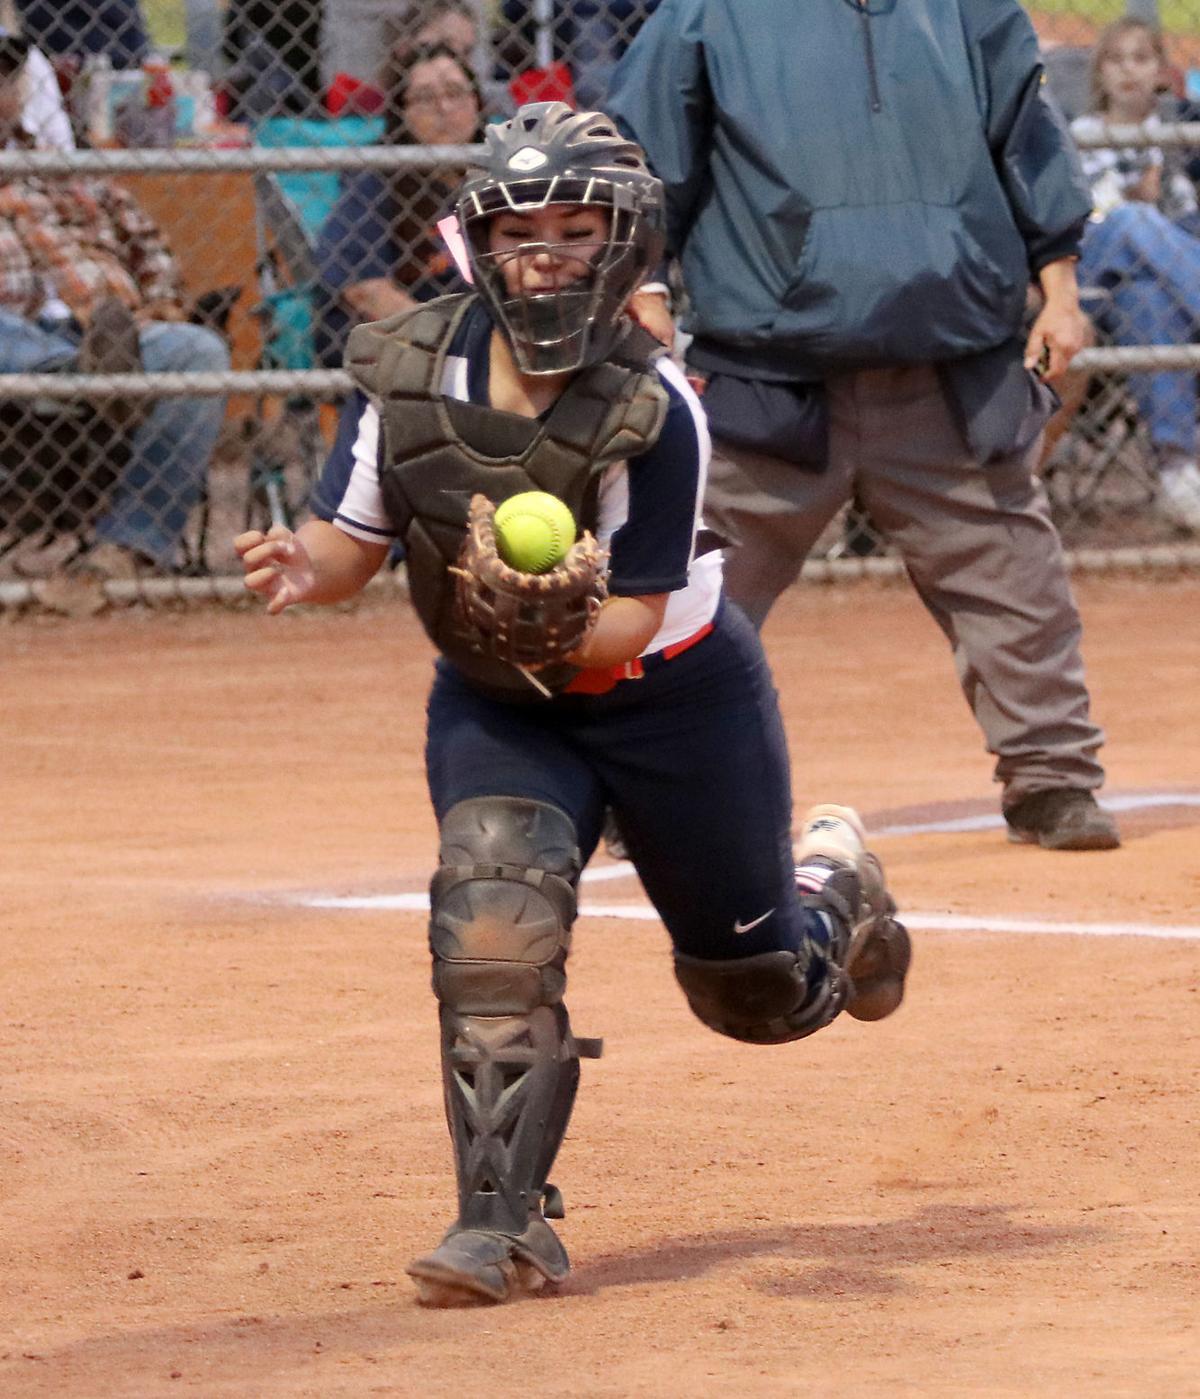 Nattie Murillo catch